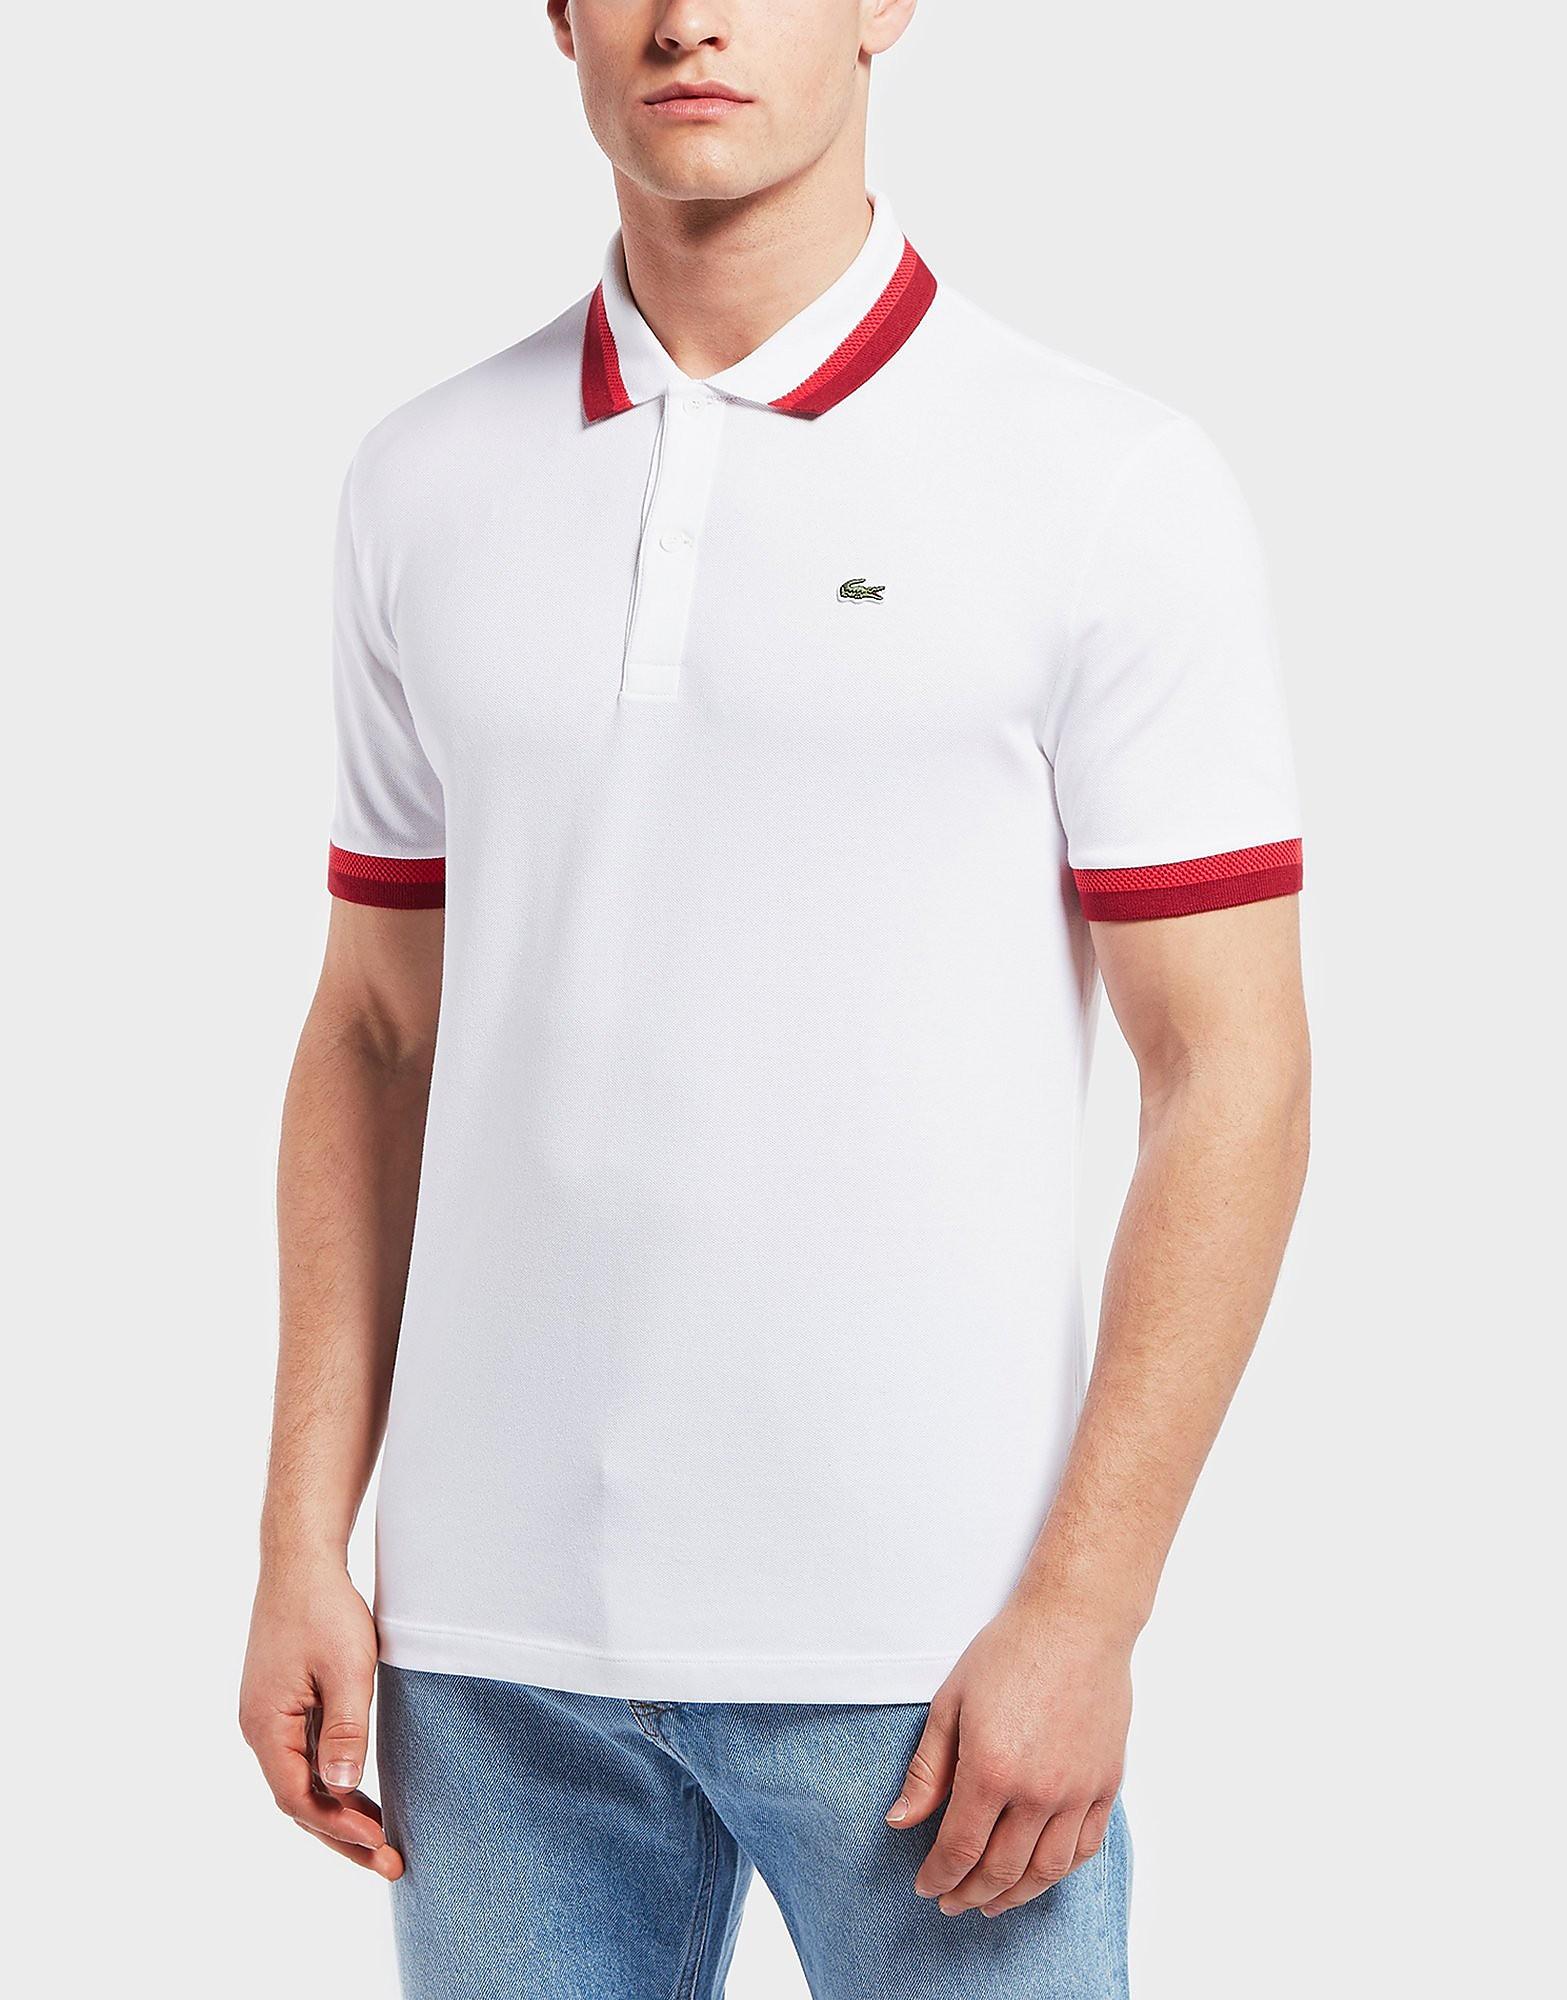 Lacoste Pima Double Tip Short Sleeve Polo Shirt